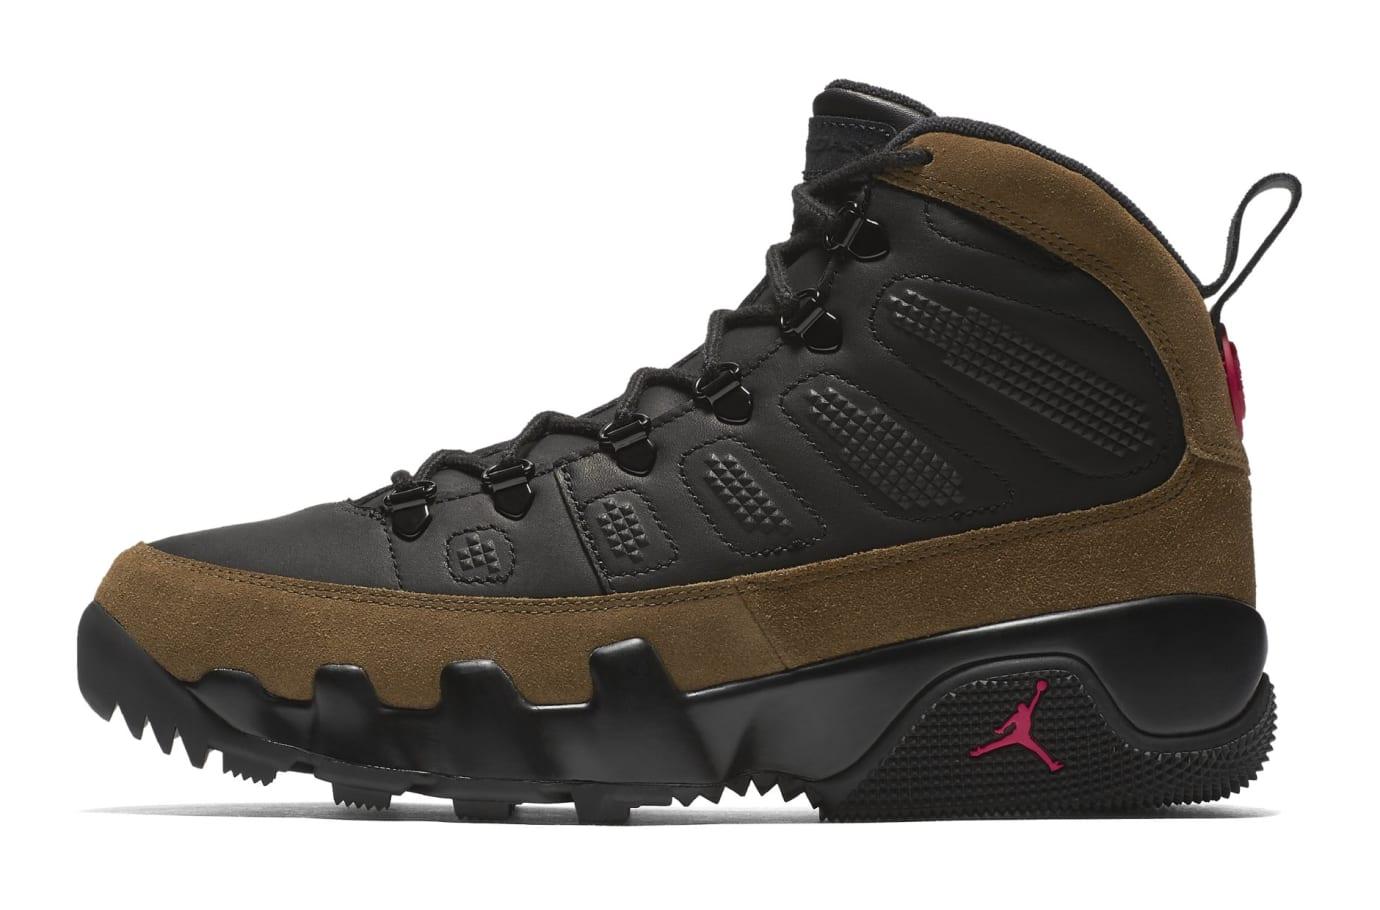 334b69bbd58724 Air Jordan 9 Boot NRG Black True Red Light Olive AO4491-012